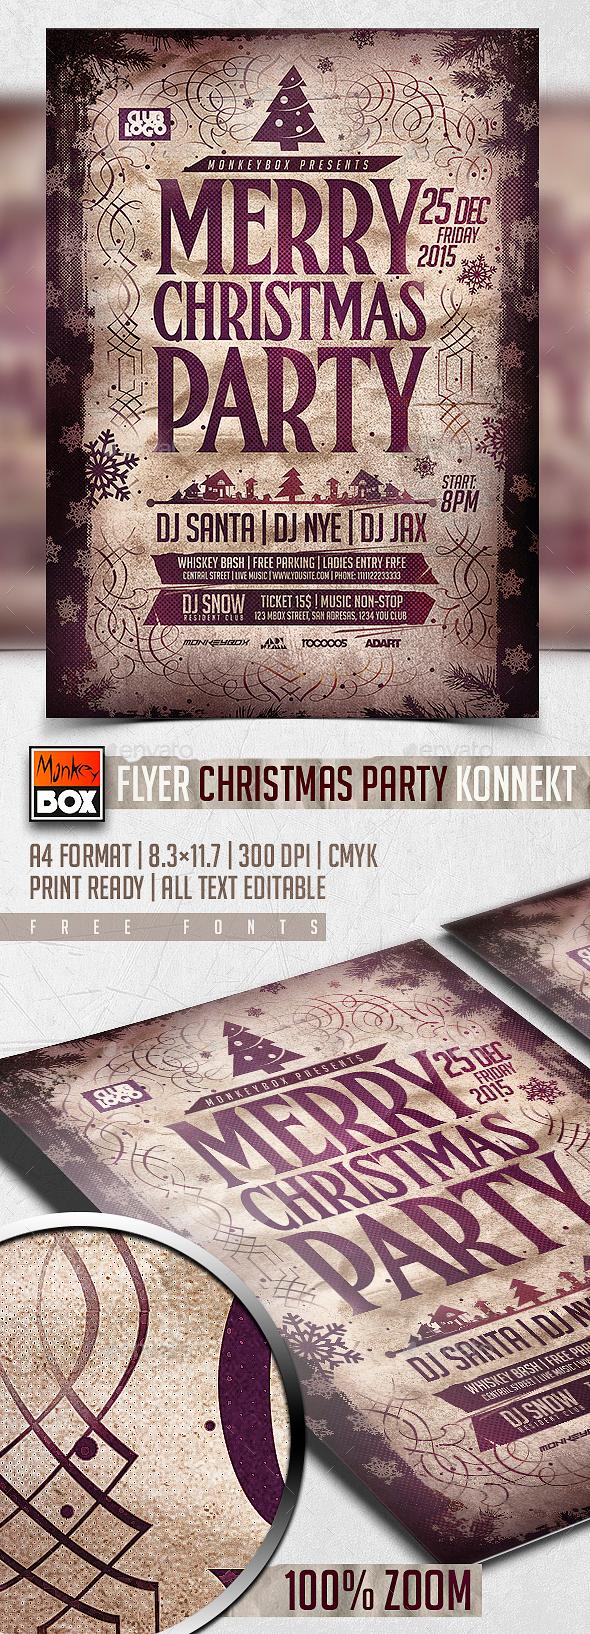 Flyer Christmas Party Konnekt - Holidays Events